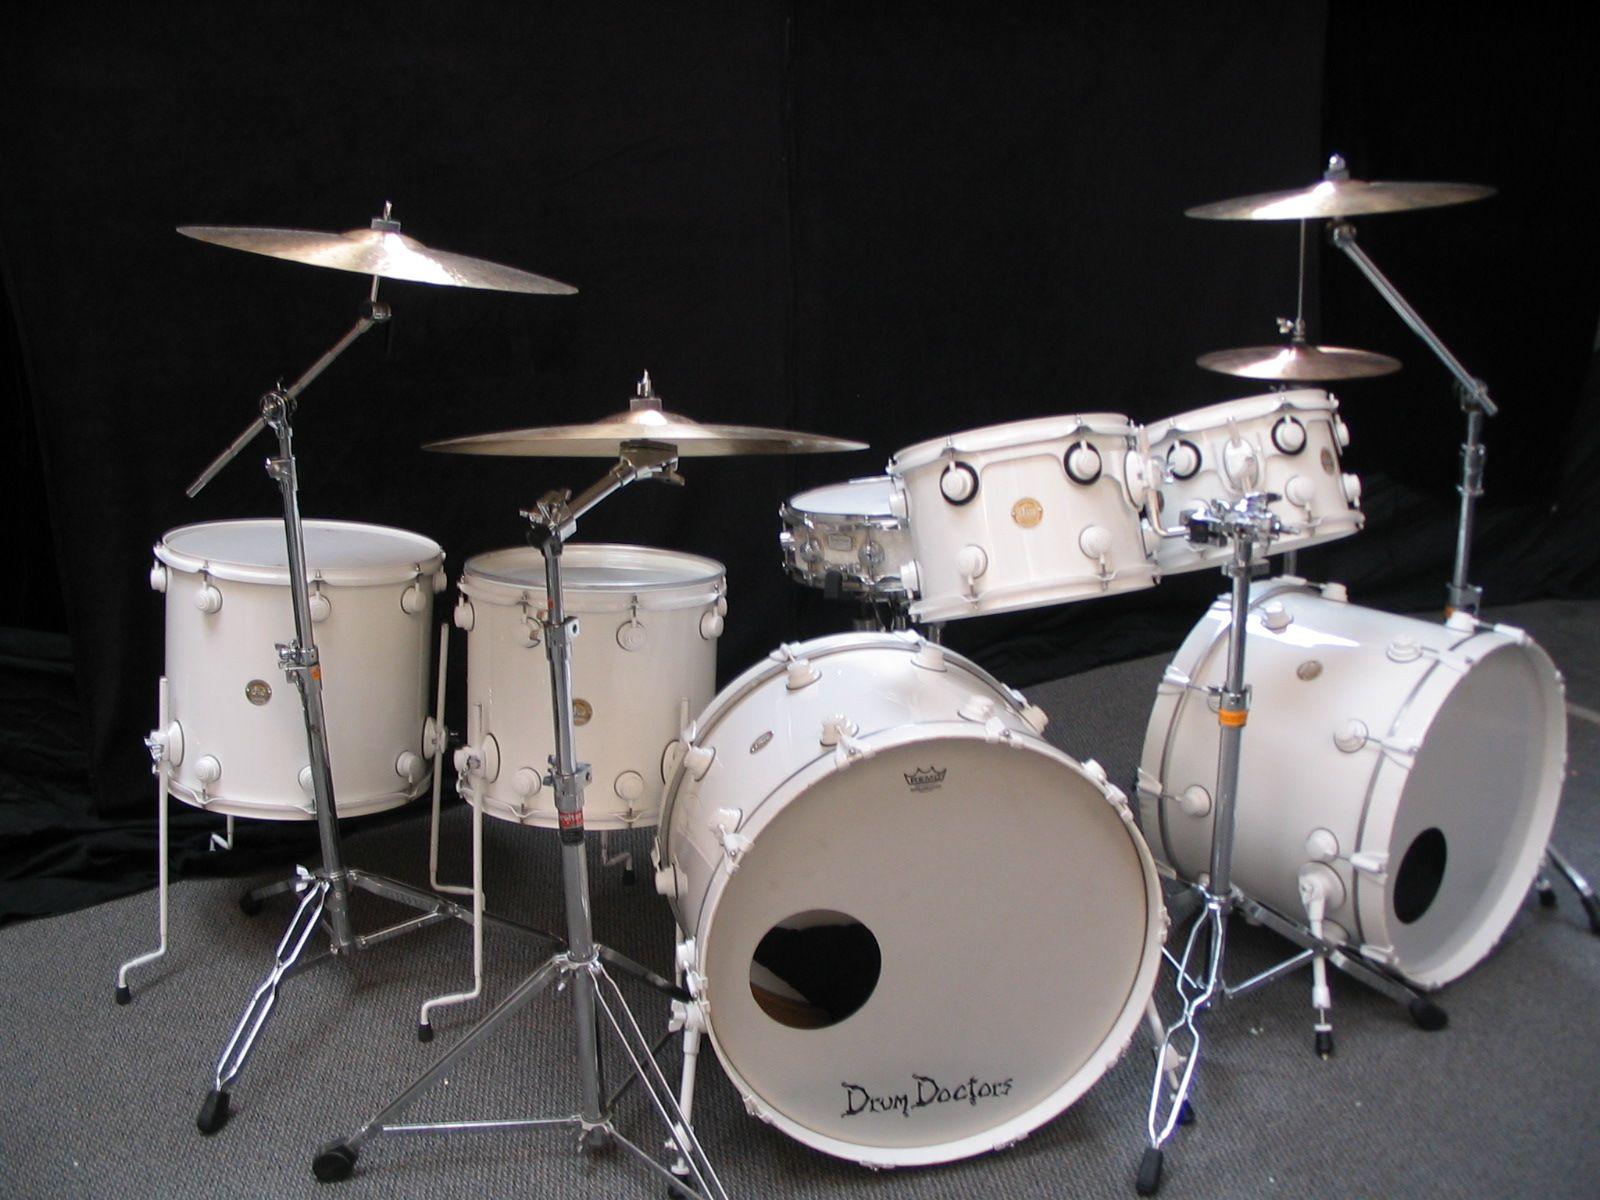 white drum sets google search drums single color kits drums snare drum drum kits. Black Bedroom Furniture Sets. Home Design Ideas